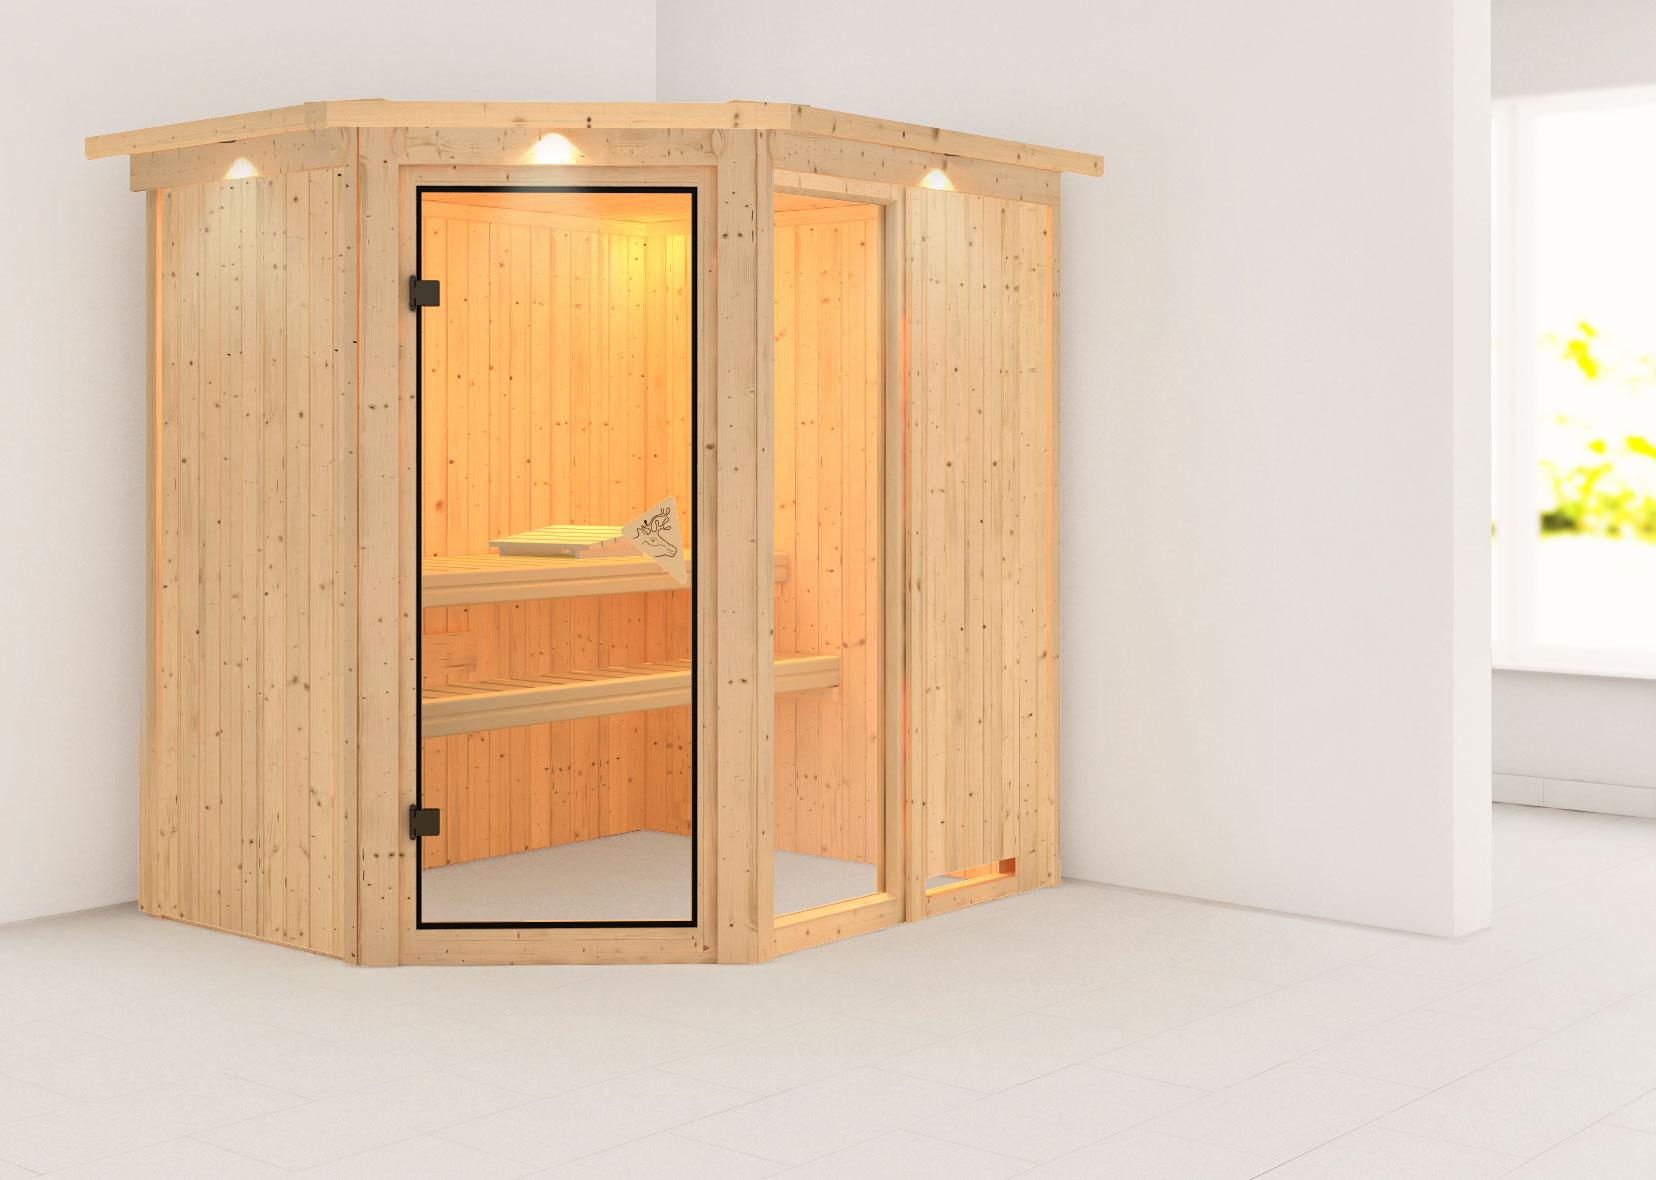 karibu sauna fiona1 68mm dachkranz ohne ofen classic t r bei. Black Bedroom Furniture Sets. Home Design Ideas